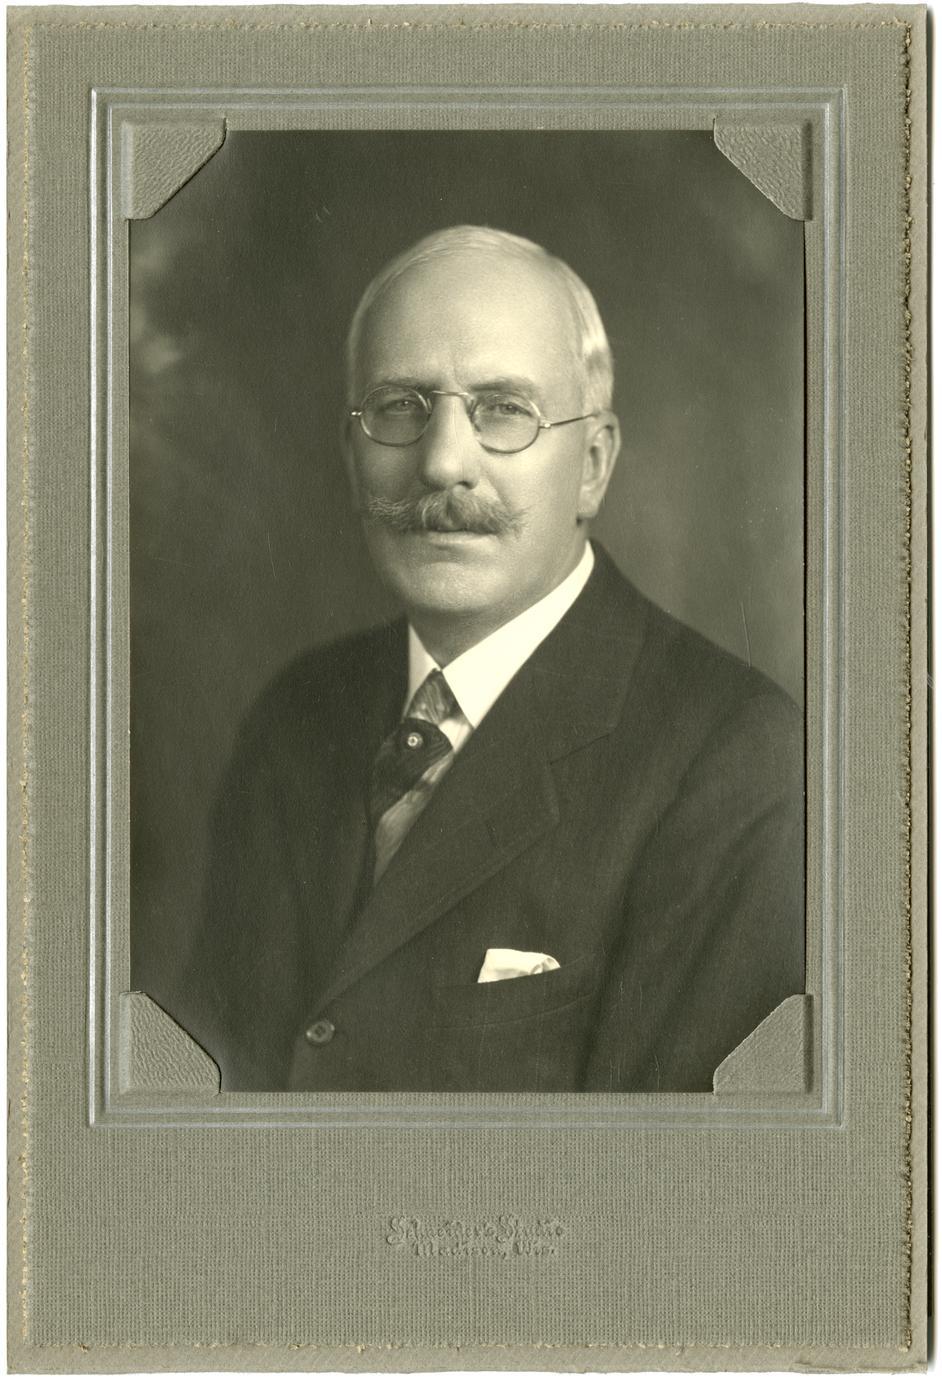 Charles H. Mills